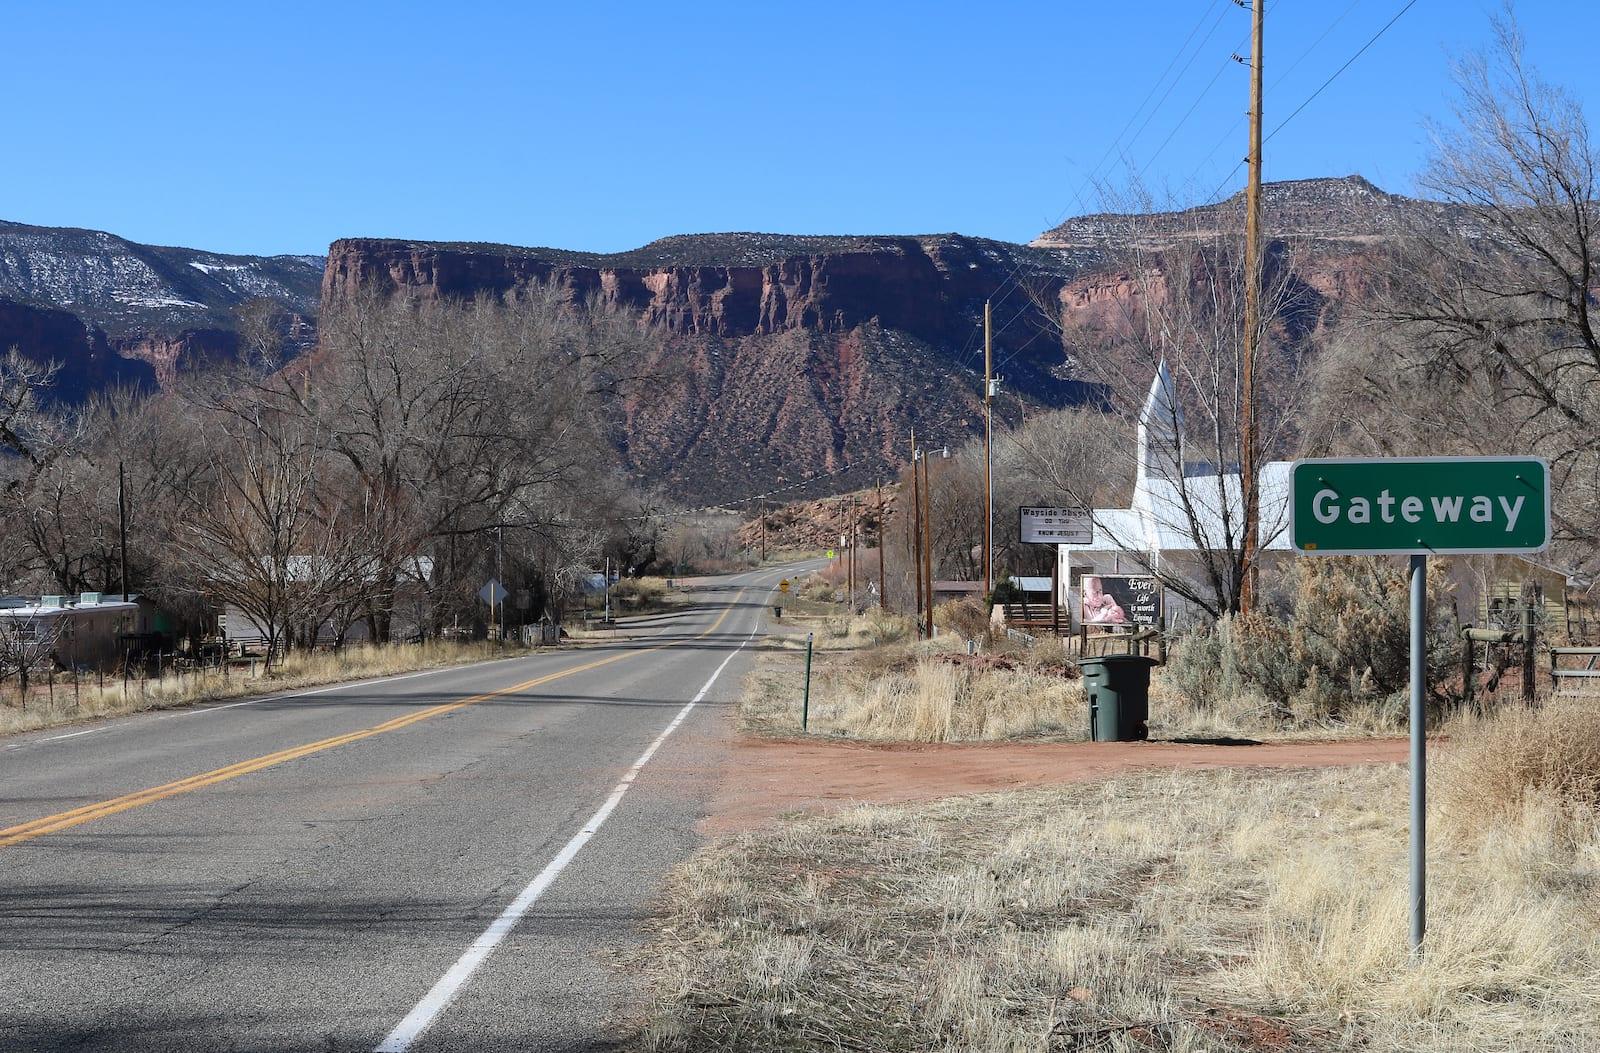 Gateway Colorado State Highway 141